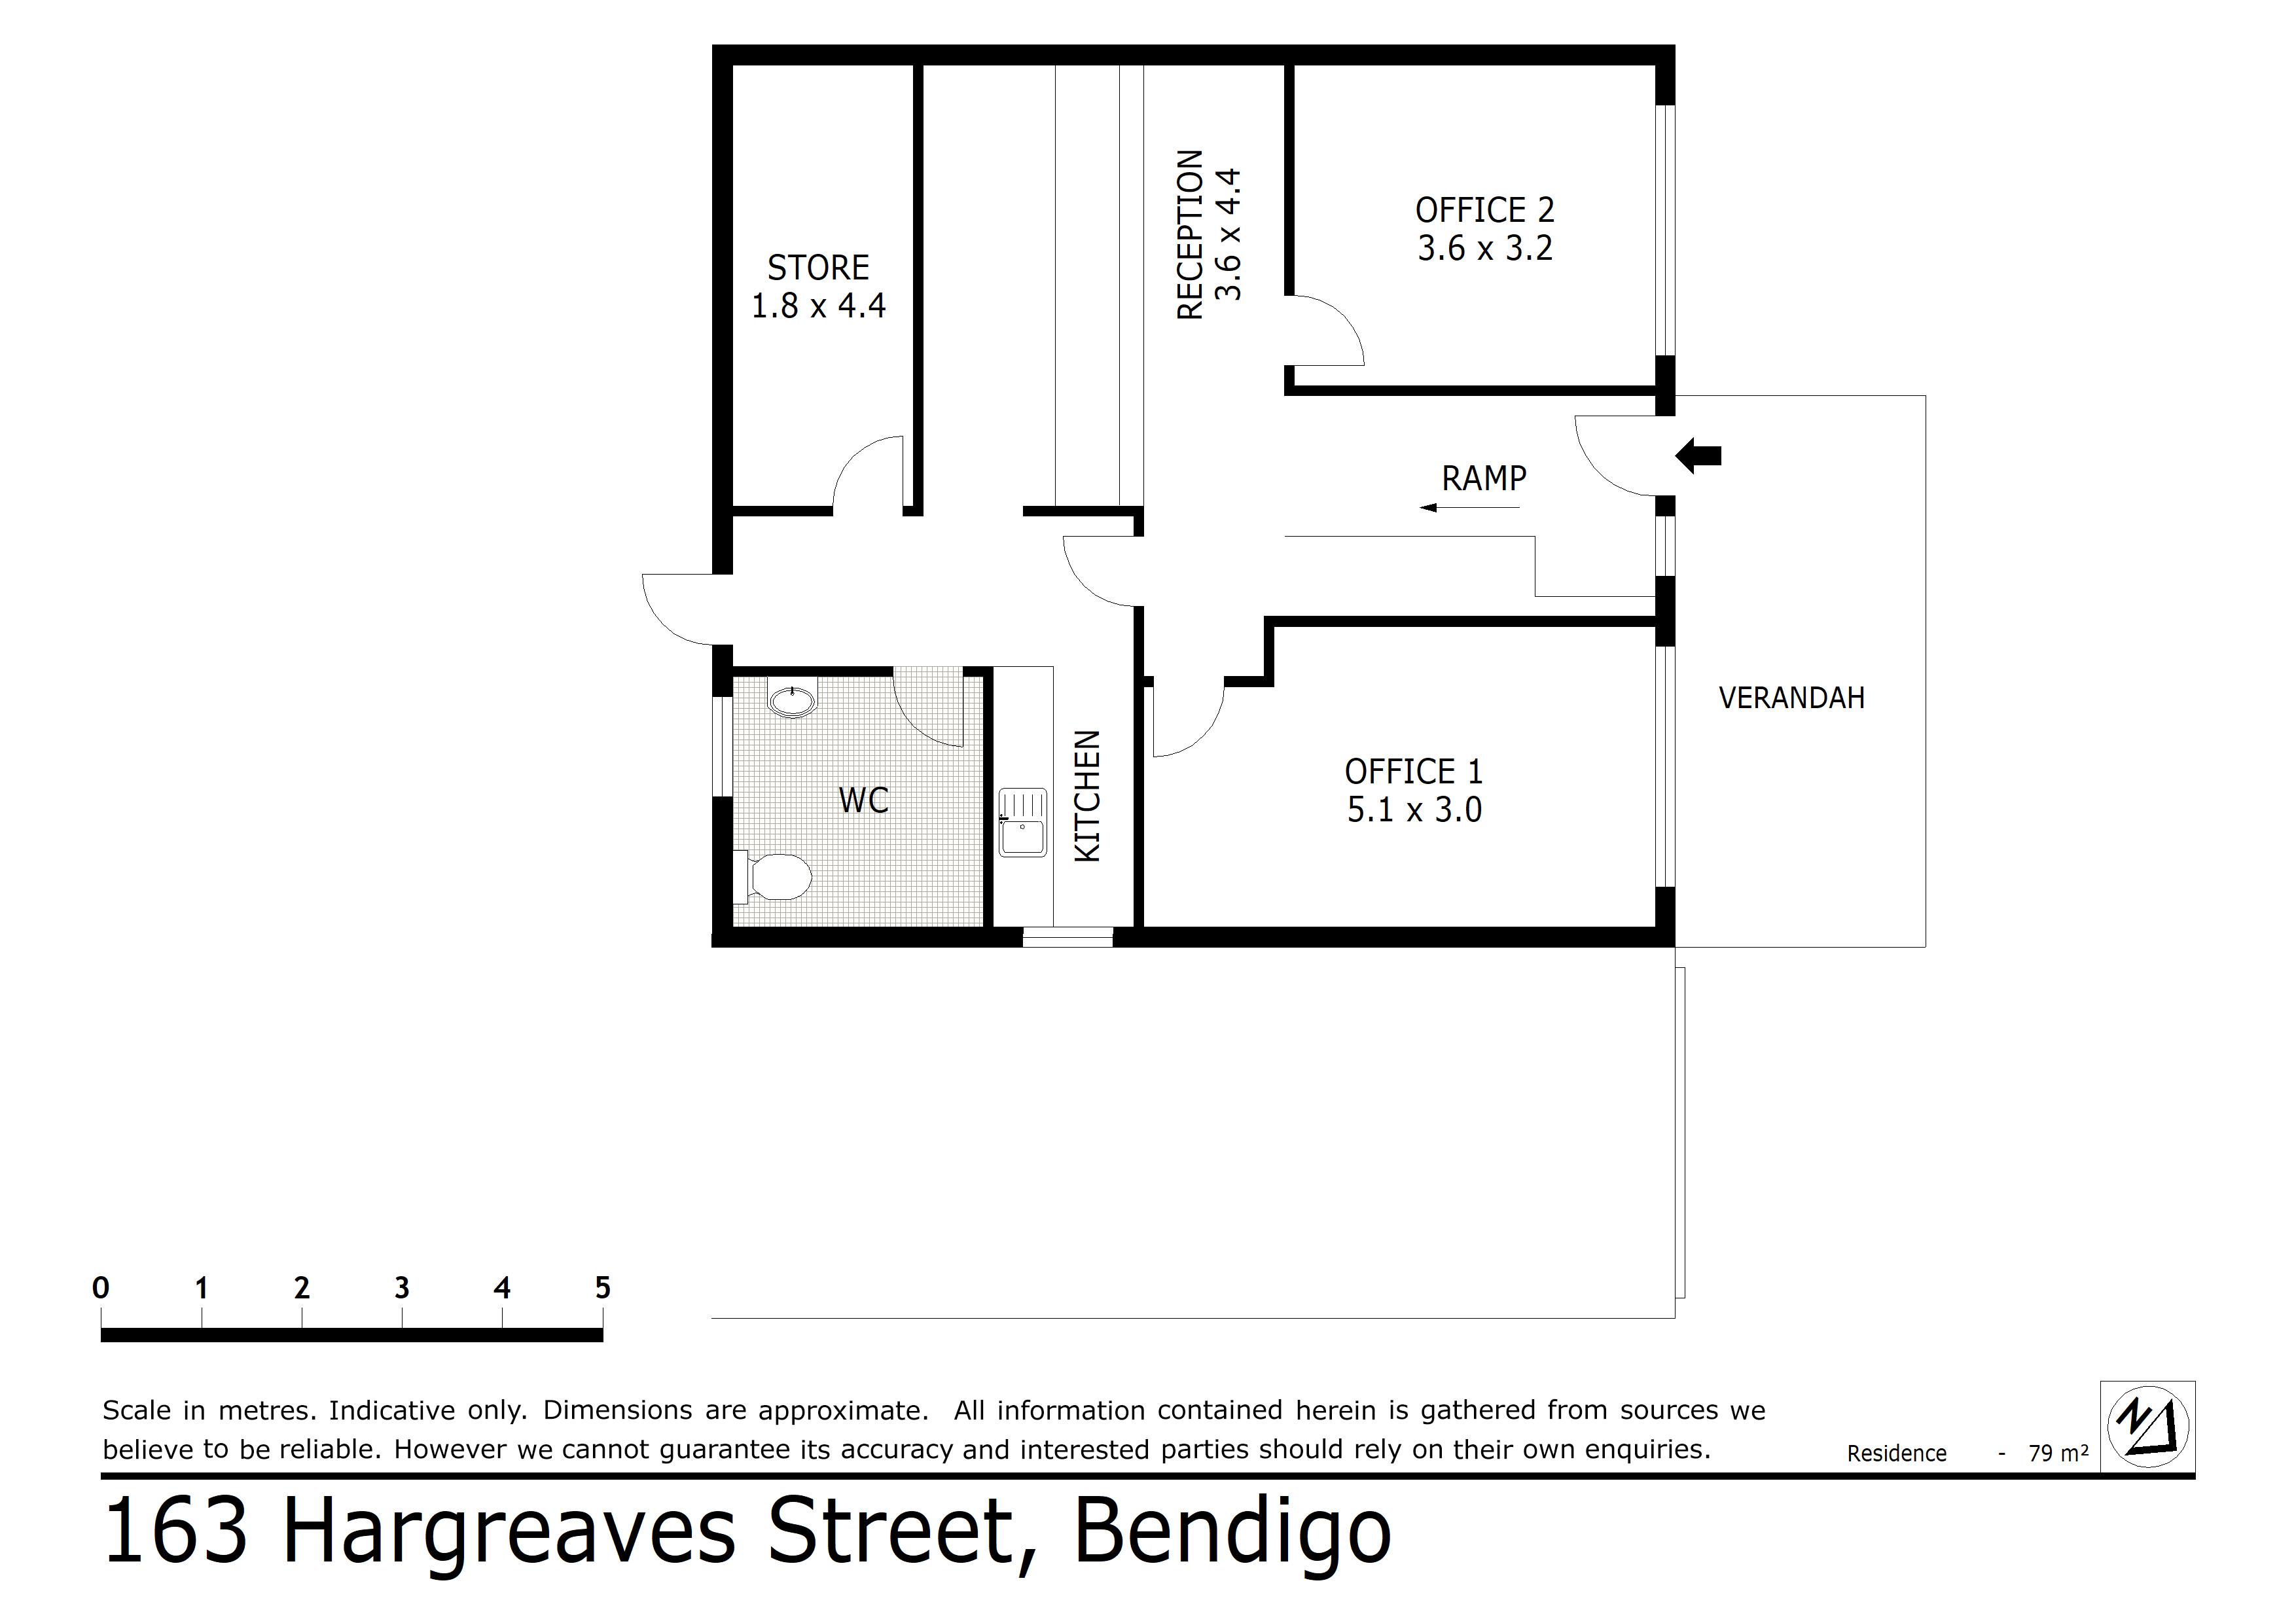 163 Hargreaves Street, Bendigo, VIC 3550